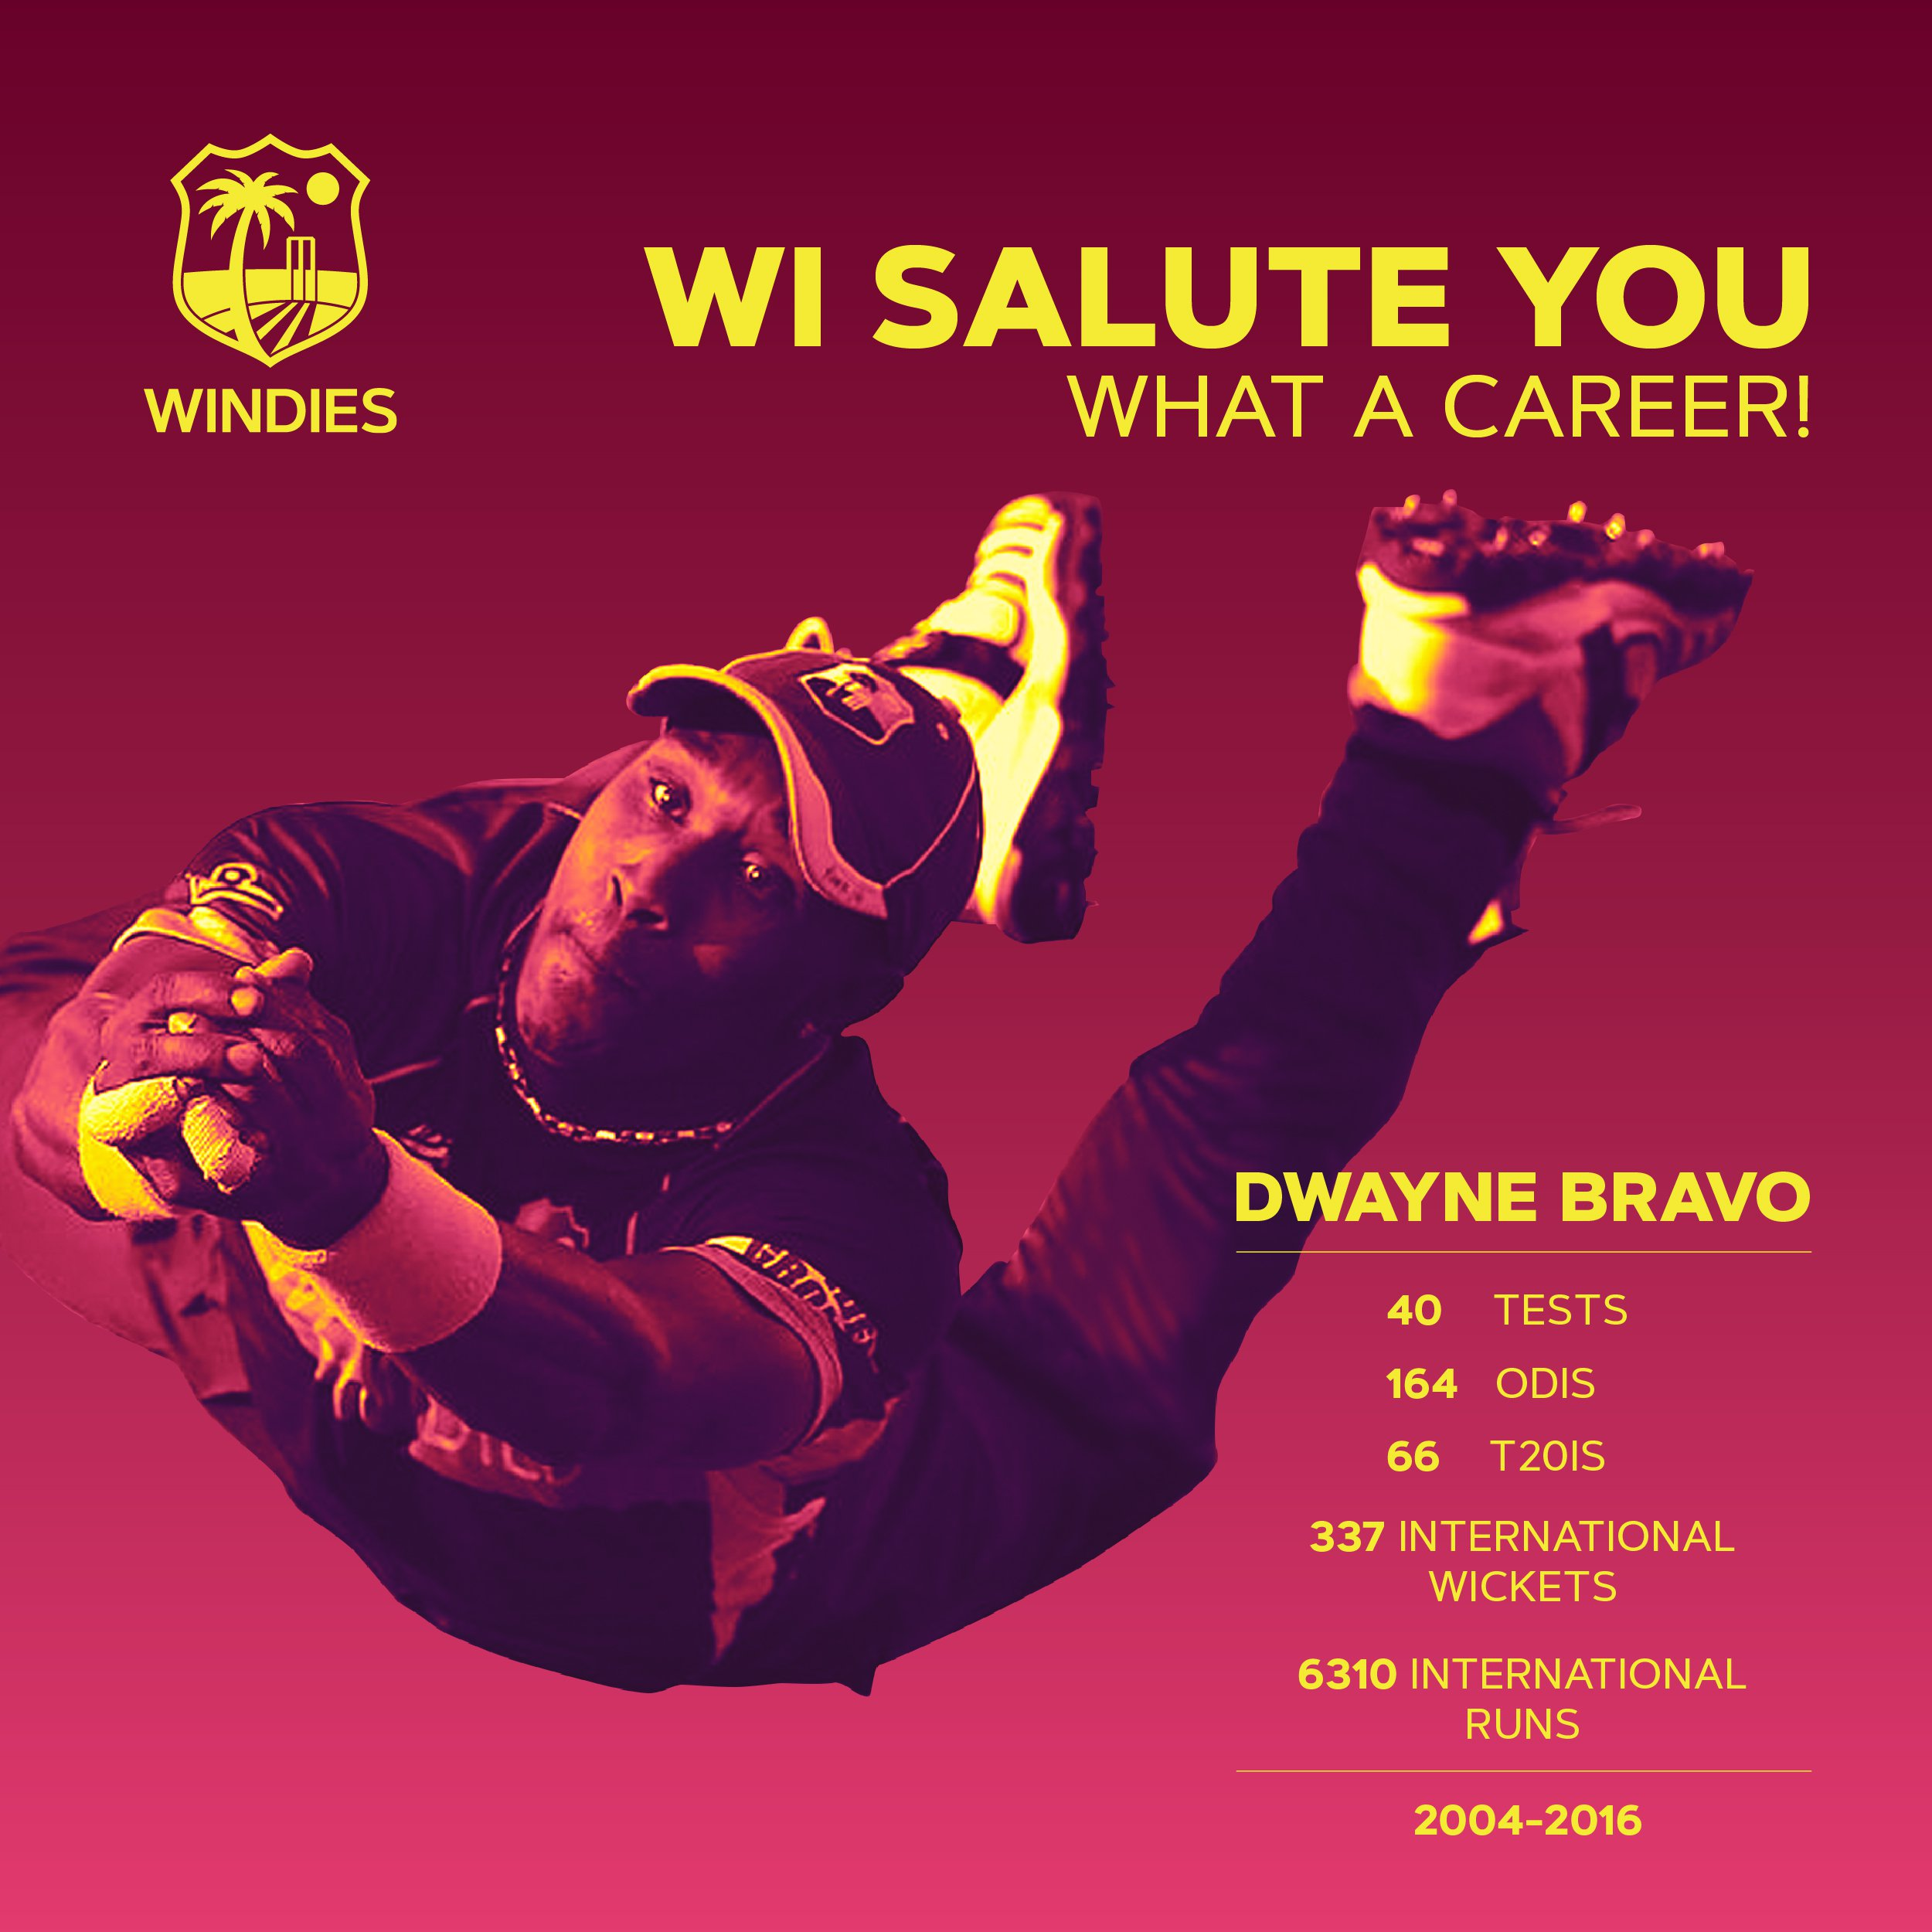 Dwayne Bravo Salute artwork-01.jpg